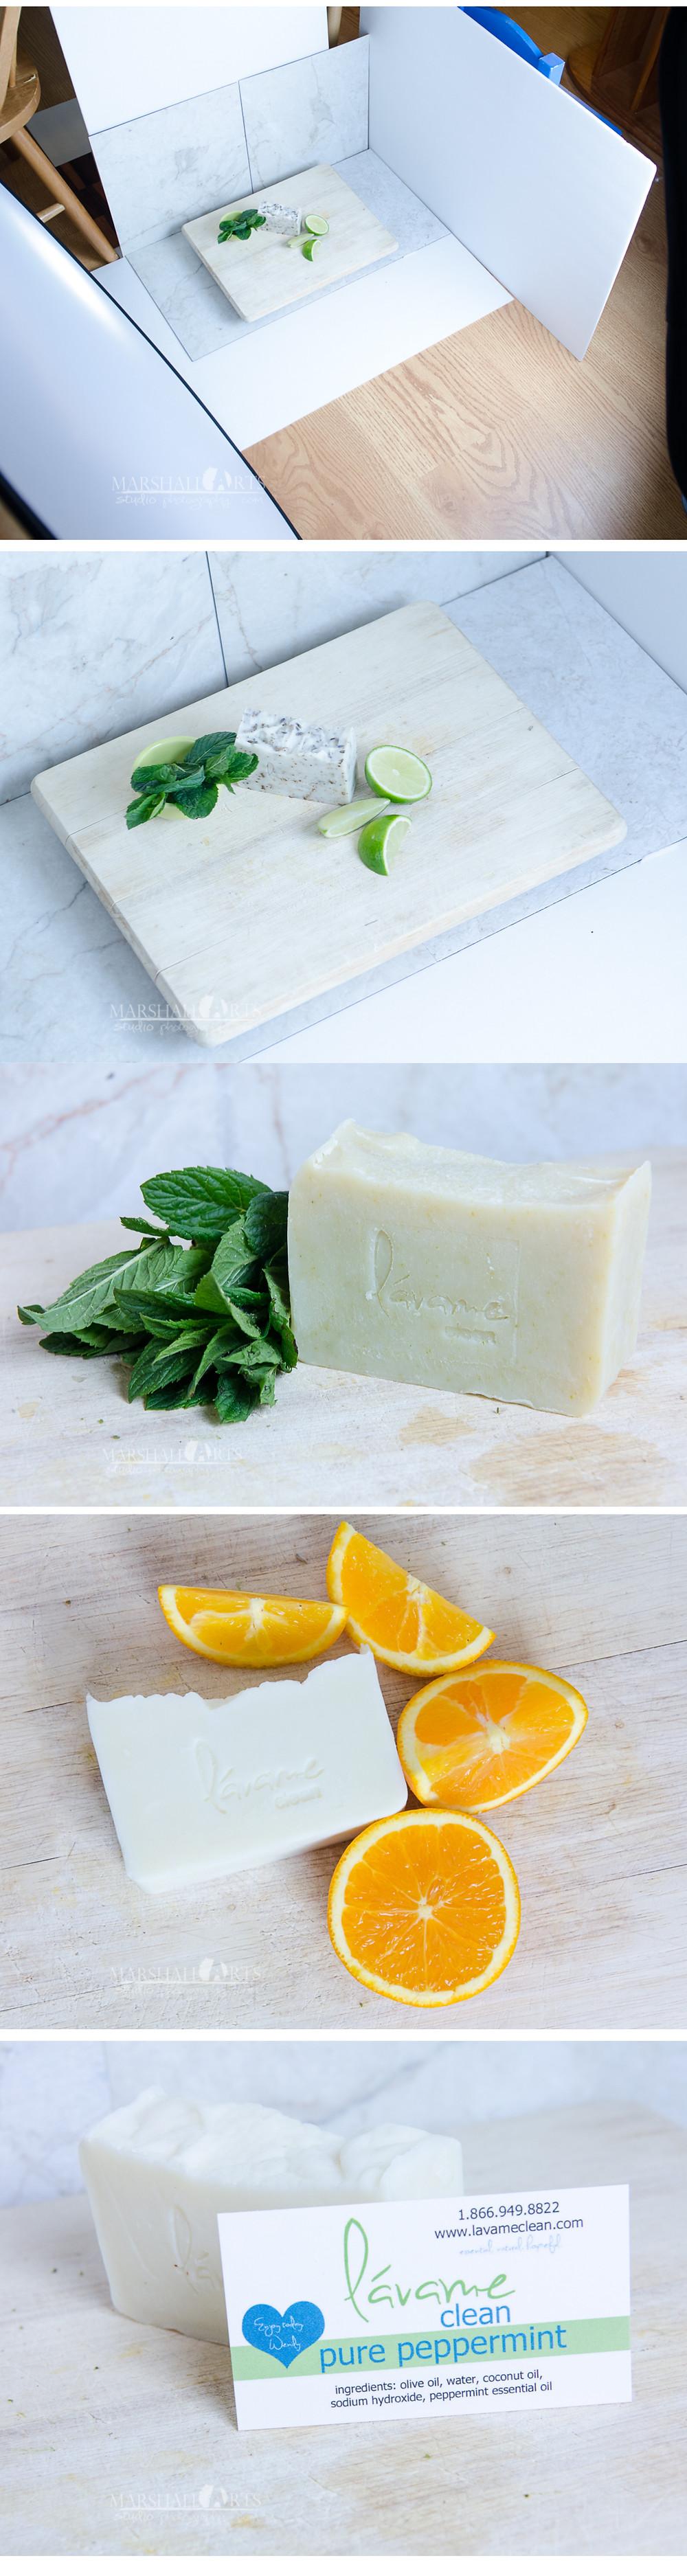 blog soap-1.jpg